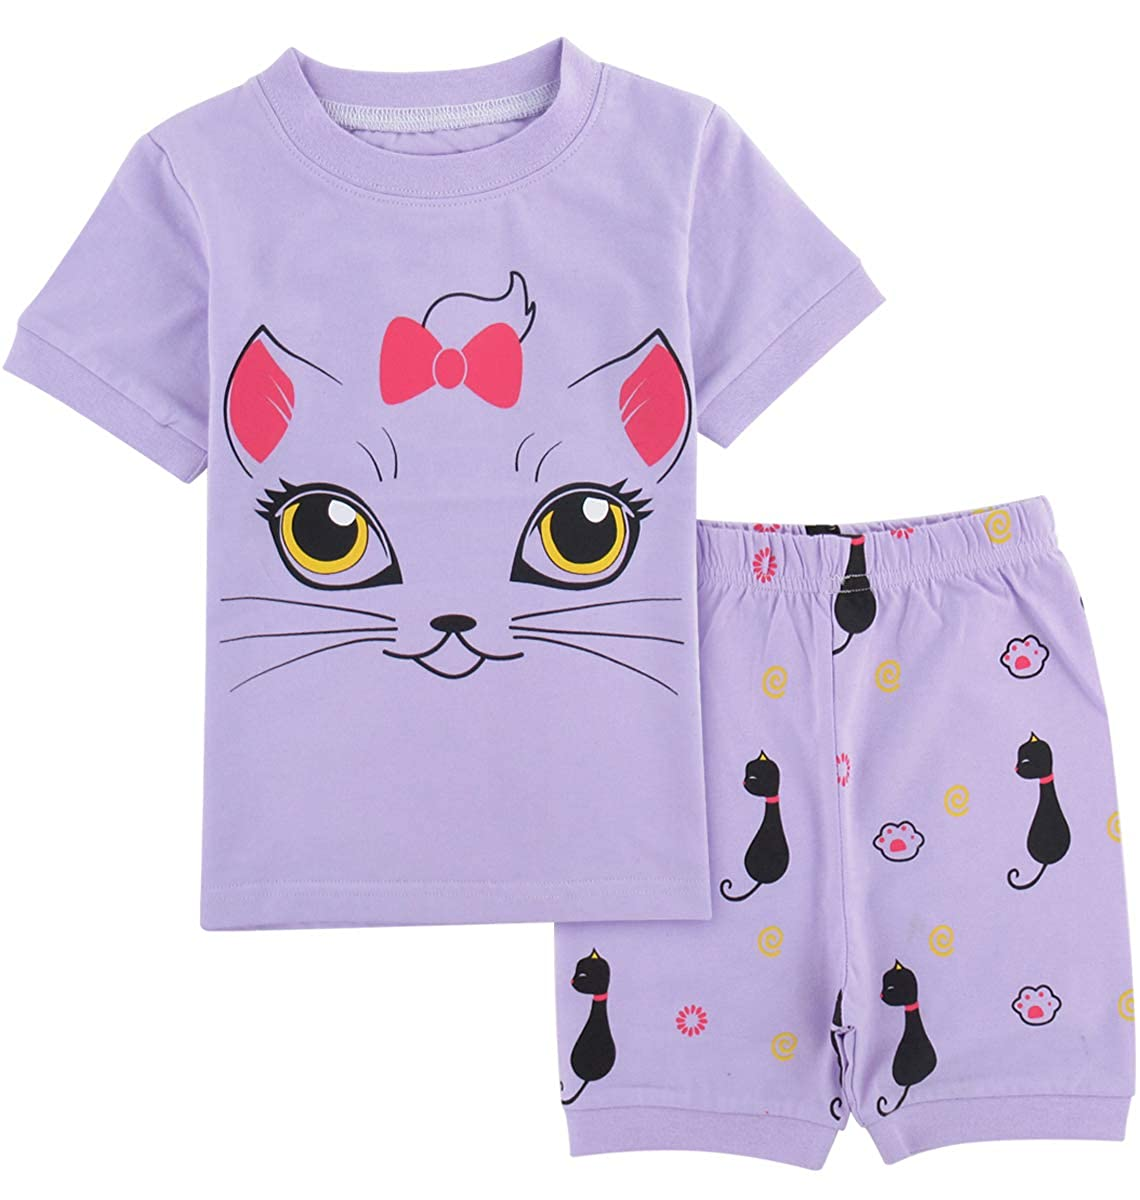 Mombebe Niña Pijamas Unicornio Infantil Verano Ropa Chica Manga Corta: Amazon.es: Ropa y accesorios